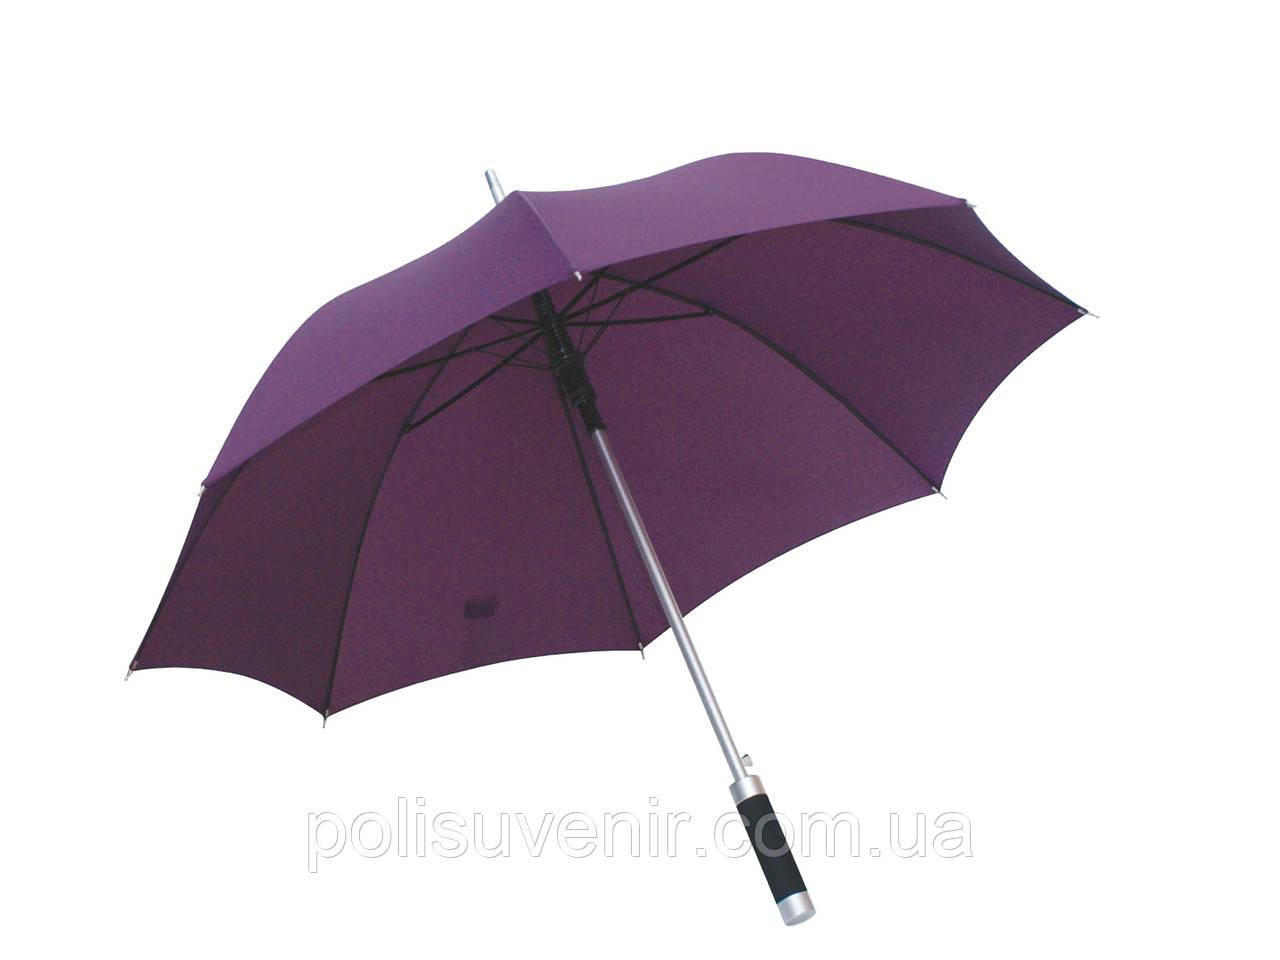 Автоматична парасолька Румба